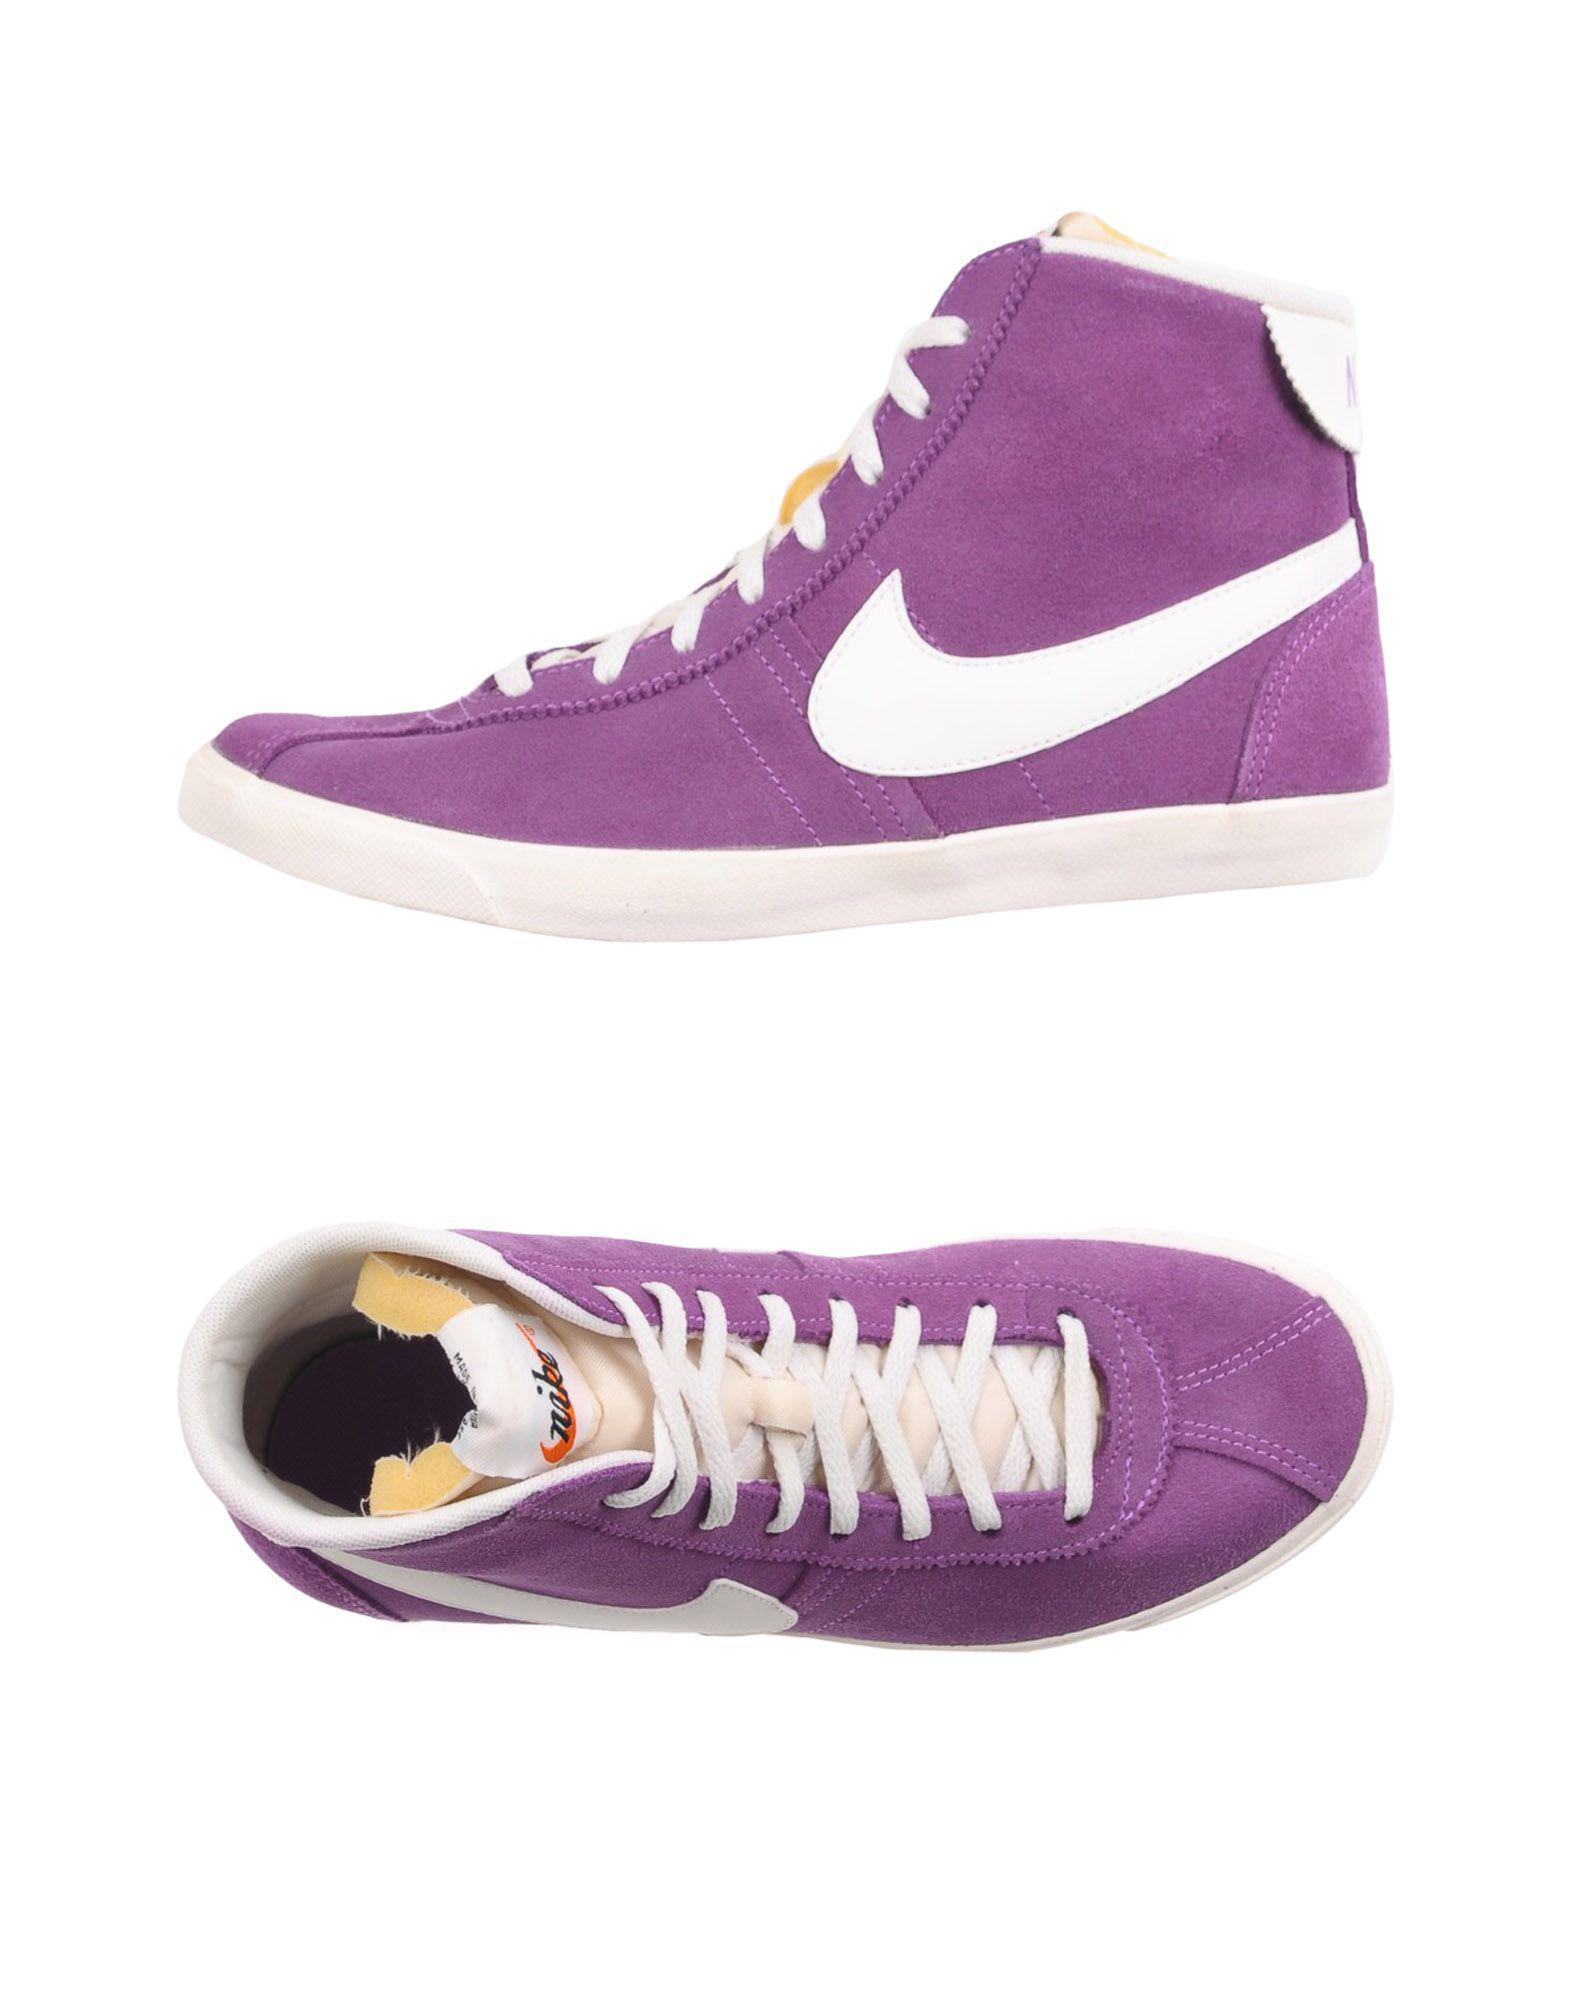 Lyst - Nike High-tops & Sneakers in Purple